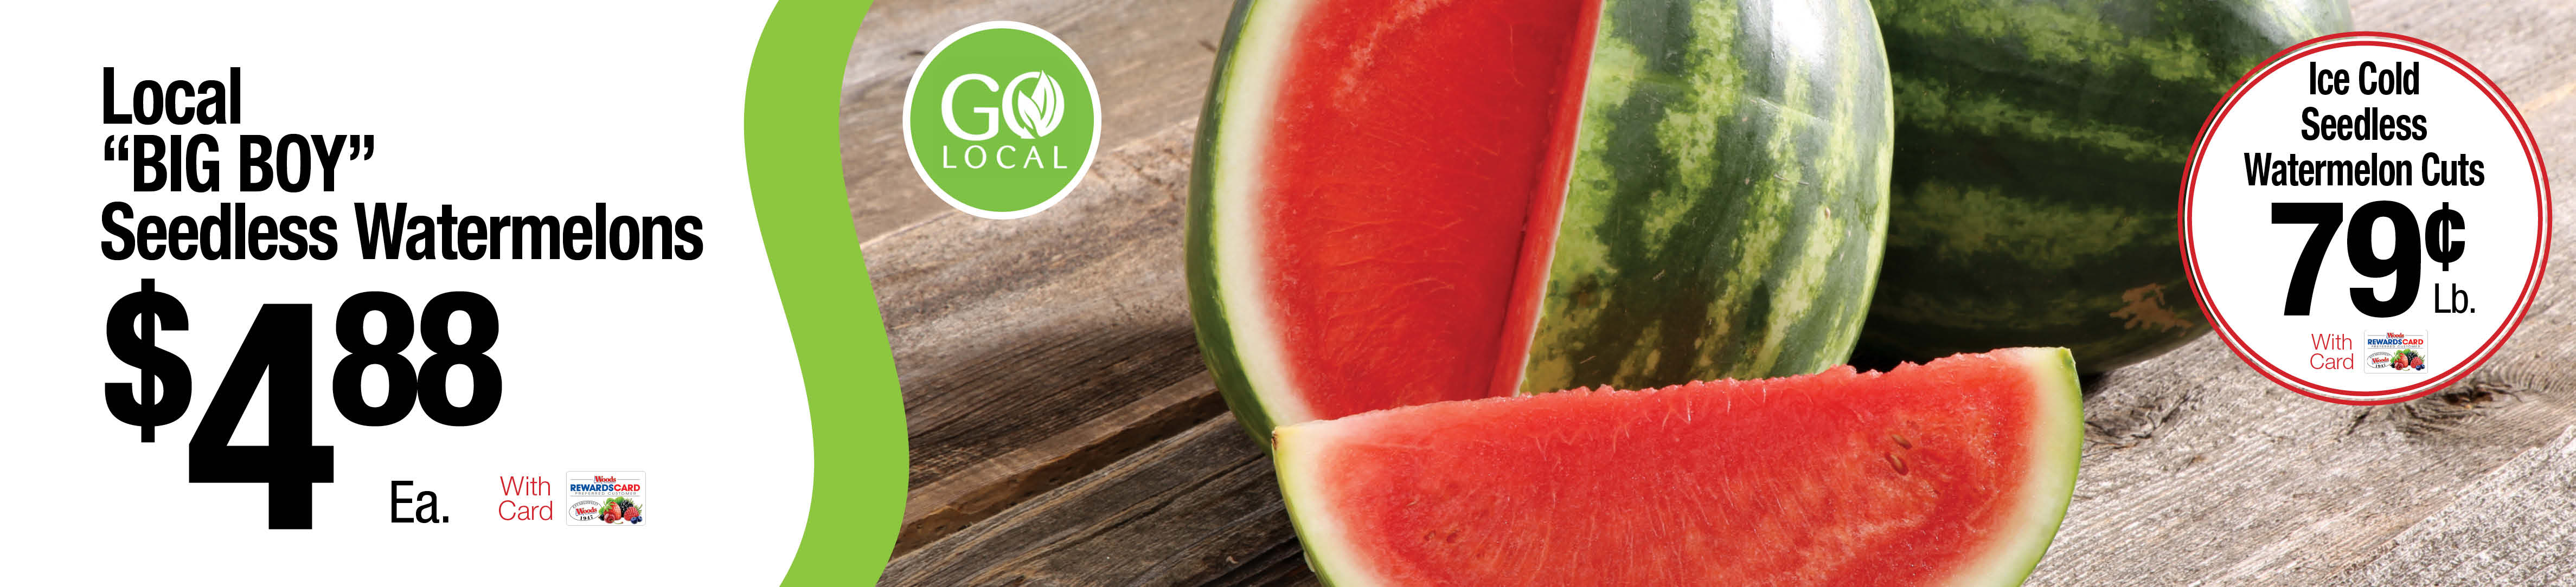 "Locally Grown ""Big Boy"" Seedless Watermelons $4.88/each"